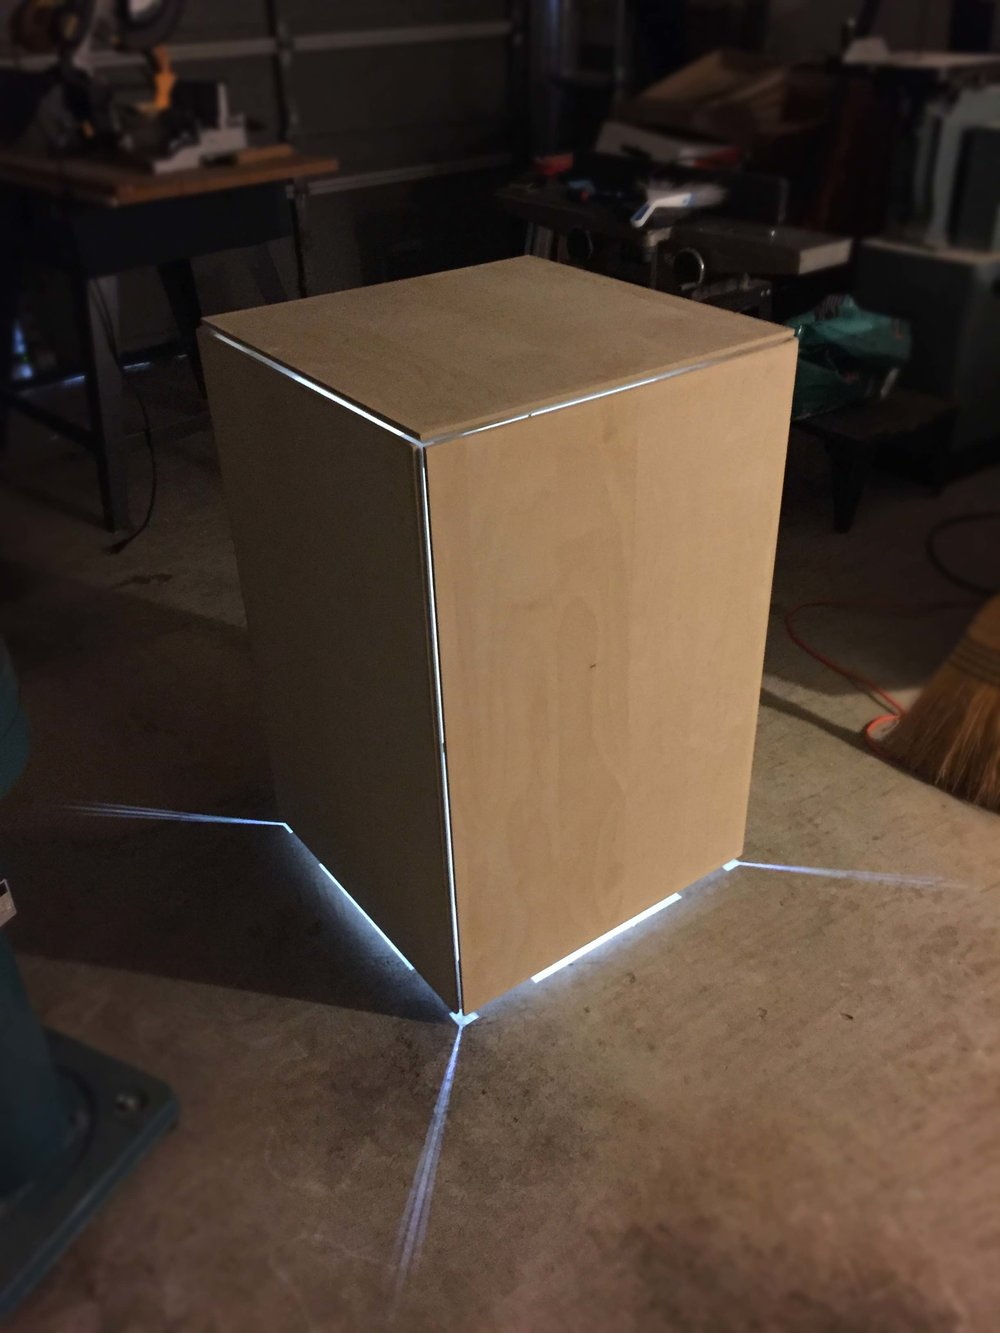 11 box lit.jpeg